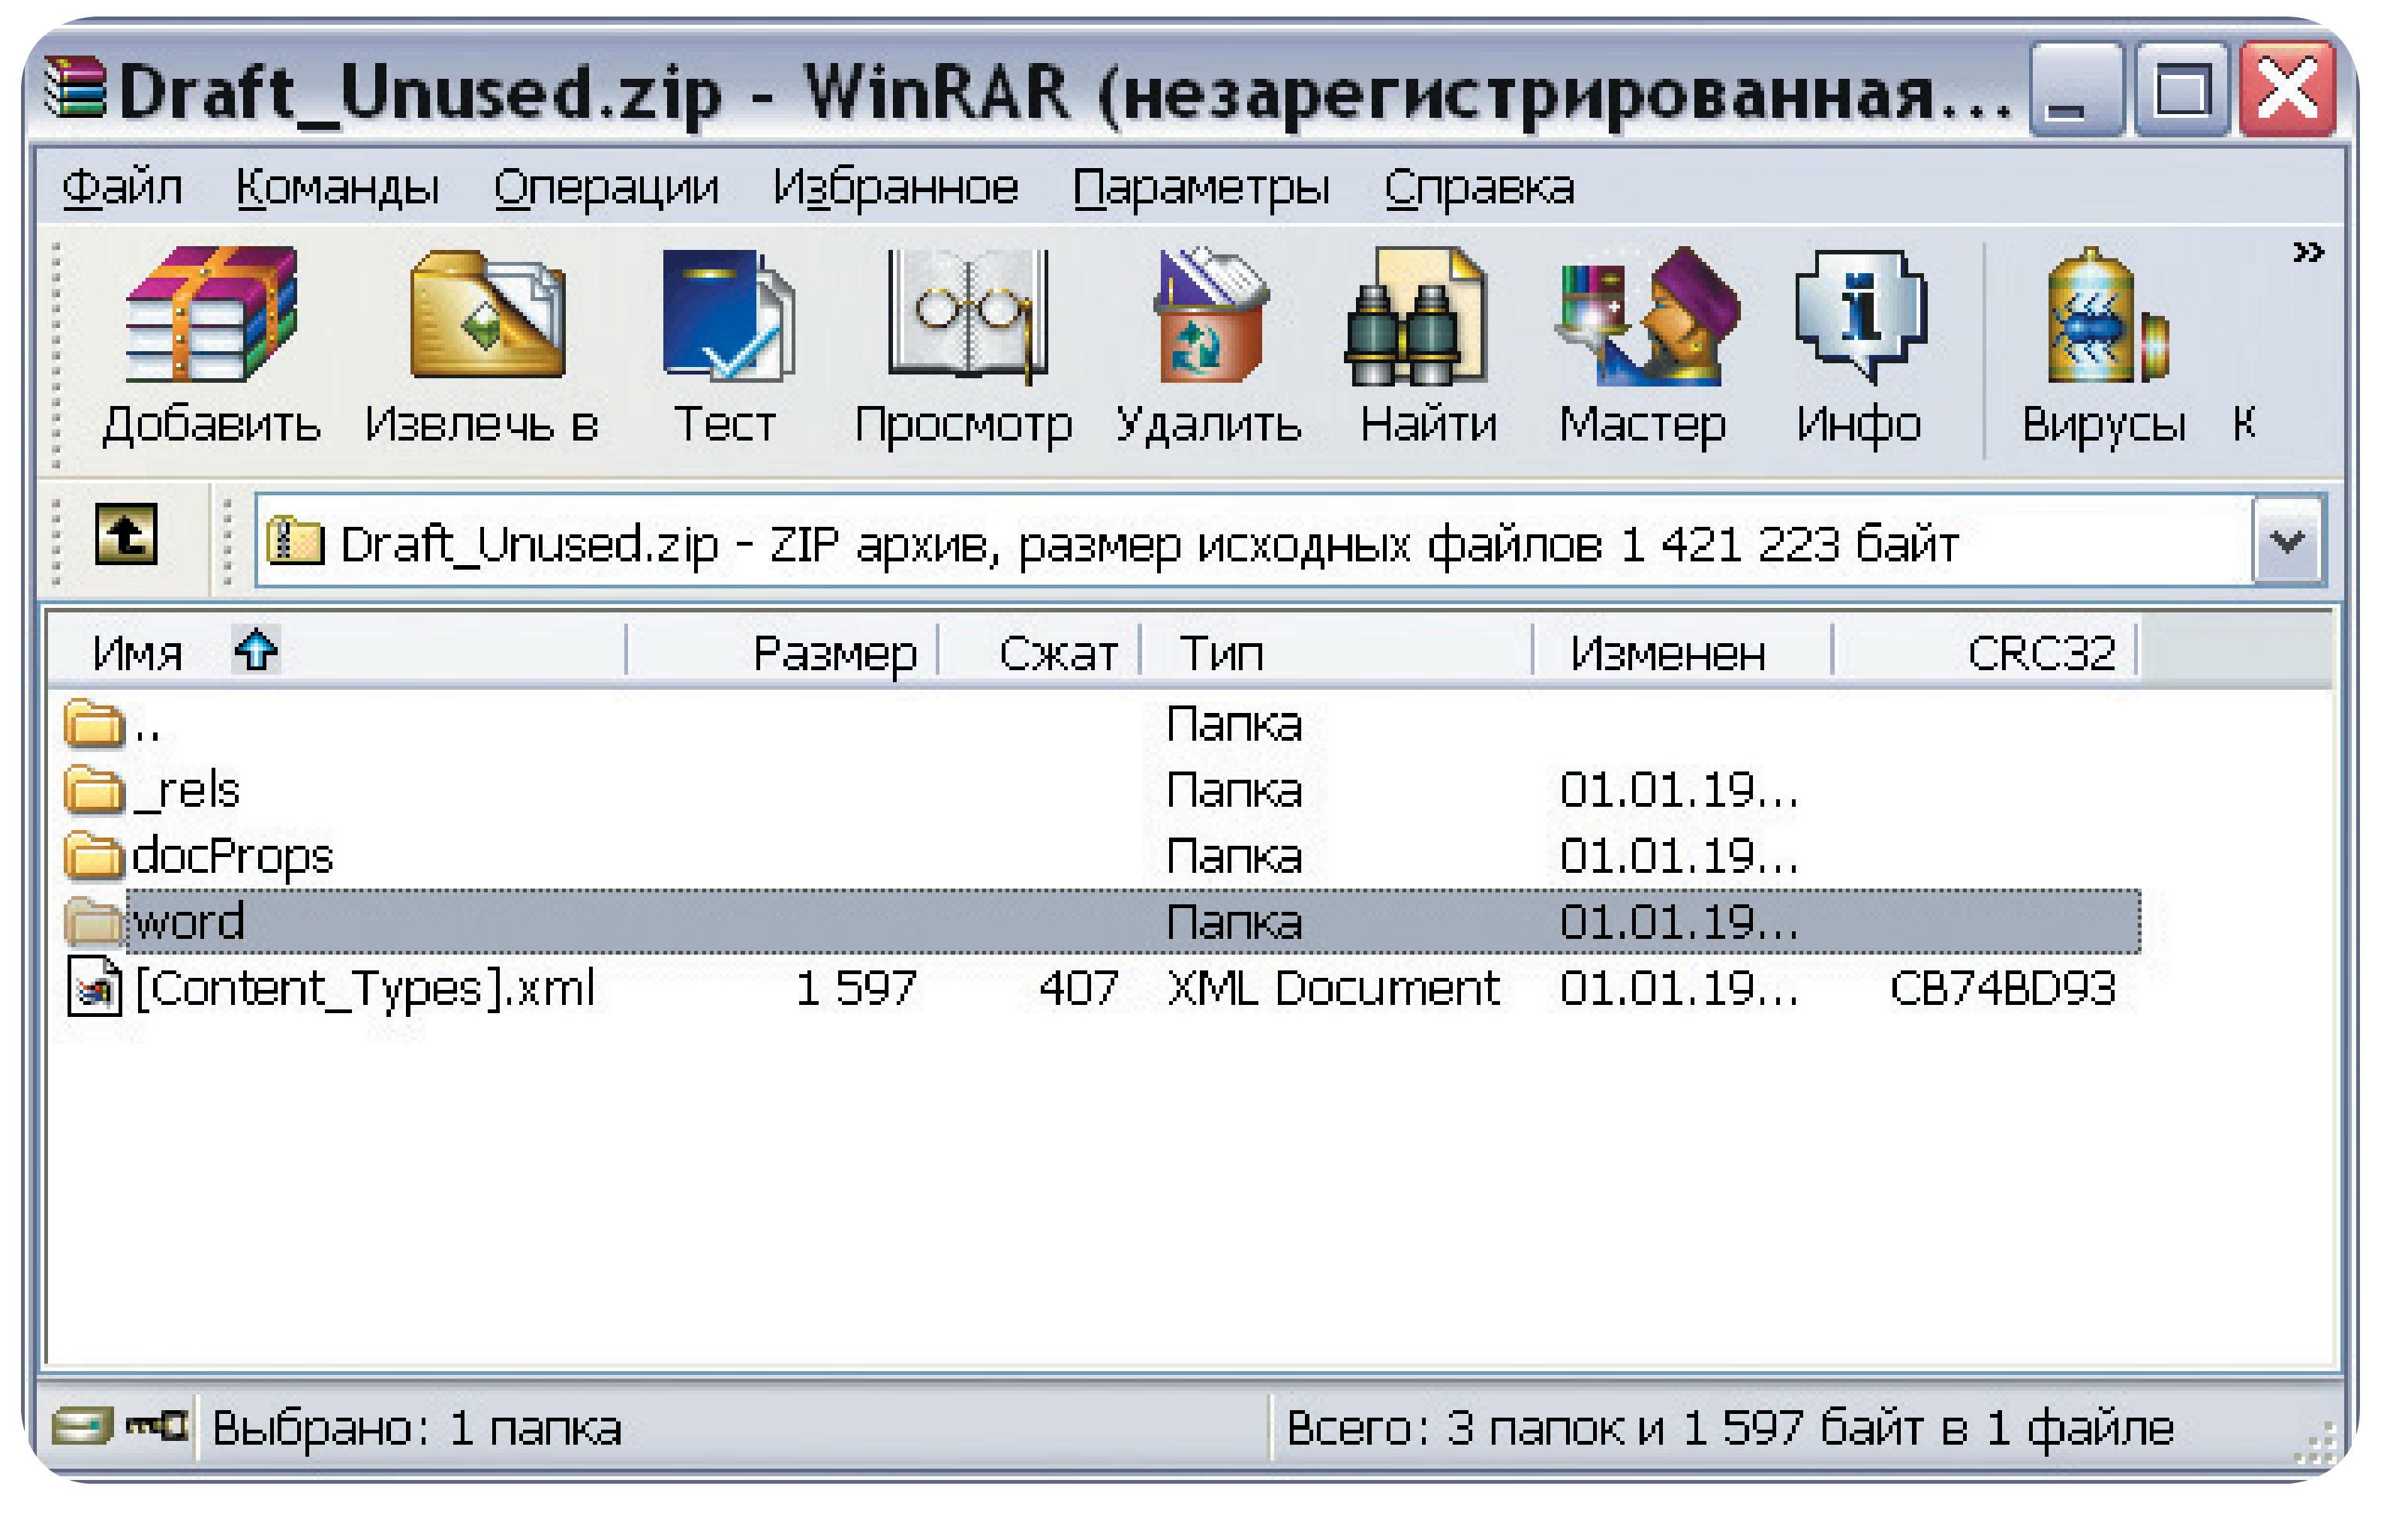 143_ht-PRO_2013_#5-6_DISK22